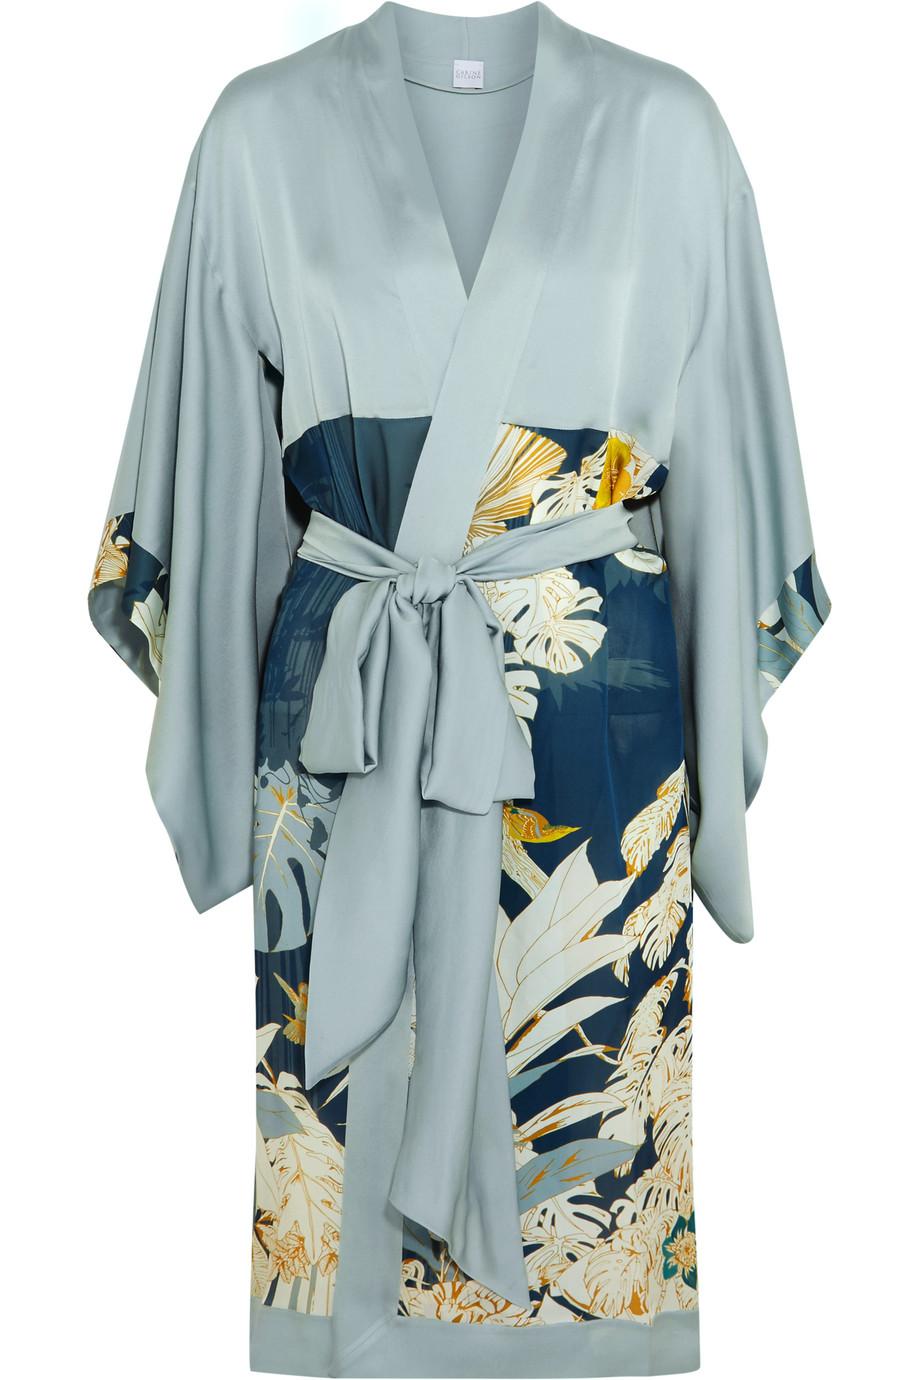 Carine Gilson Printed Silk Robe, Petrol, Women's, Size: M